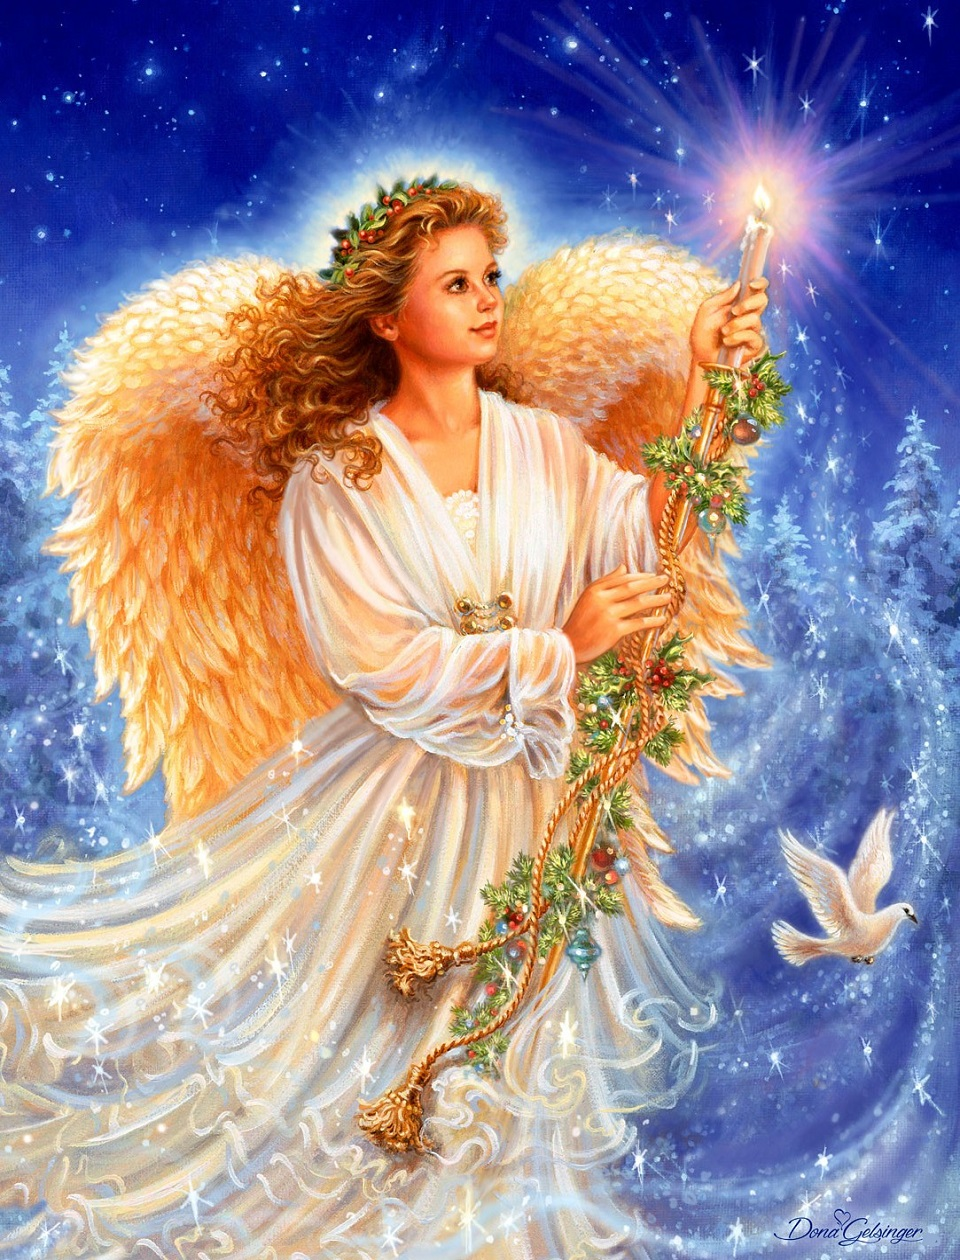 Фото открытка ангел